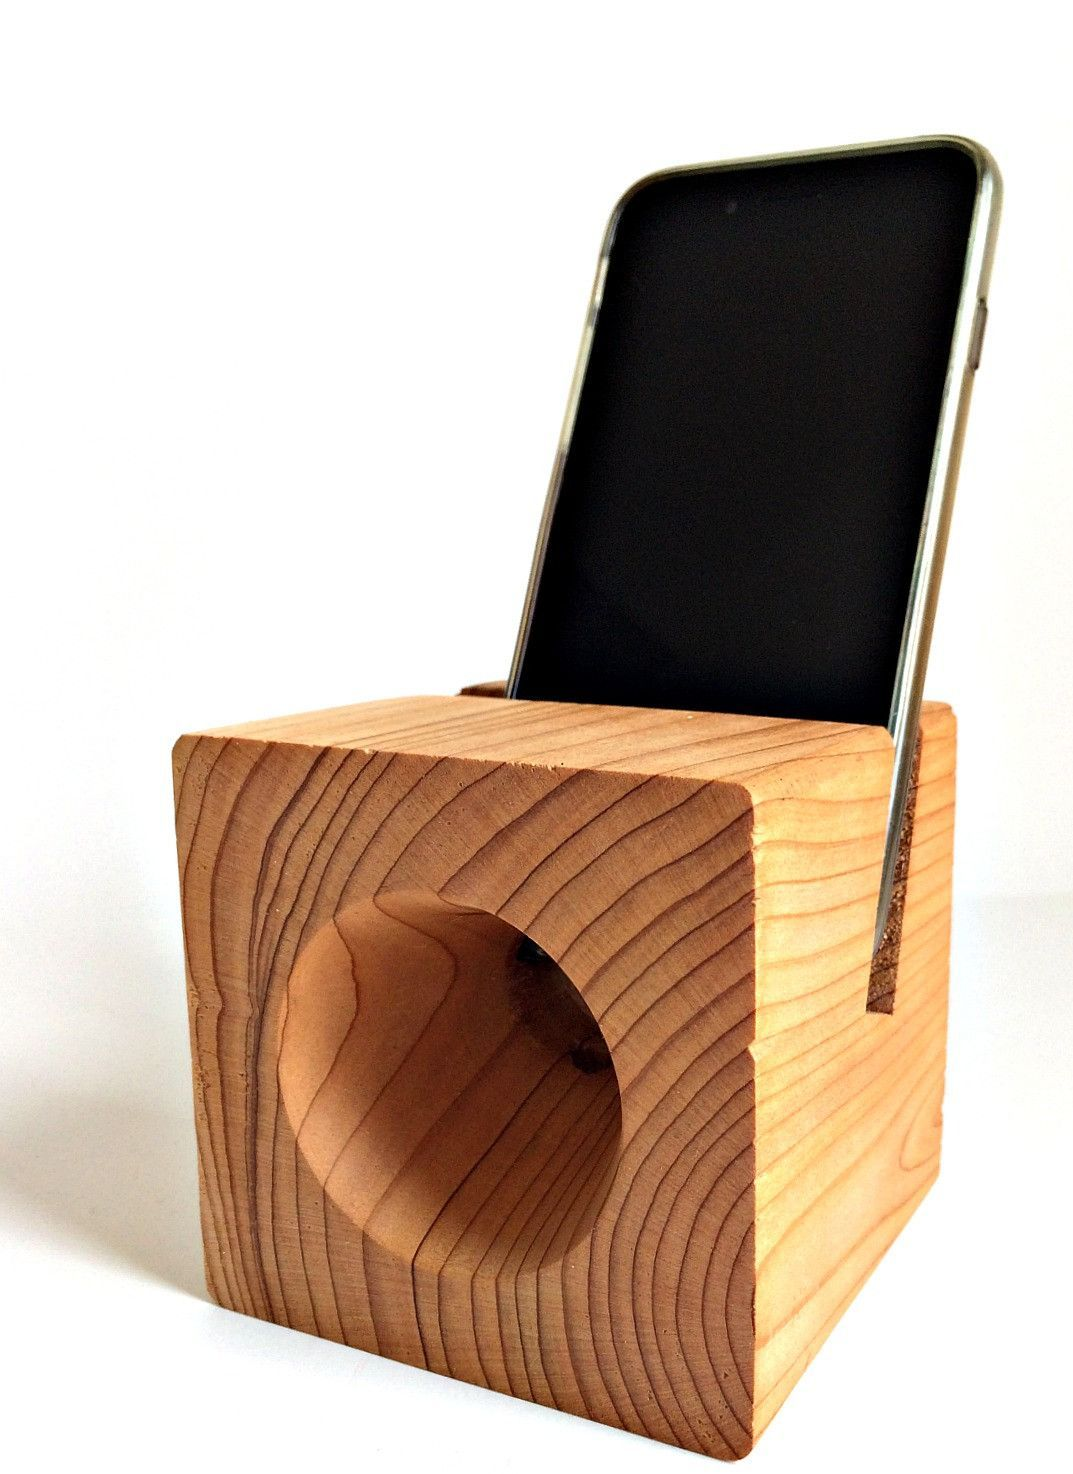 Corner Cabinet Furniture Dining Room: Cedar Handmade Phone Dock & Acoustic Amplifier